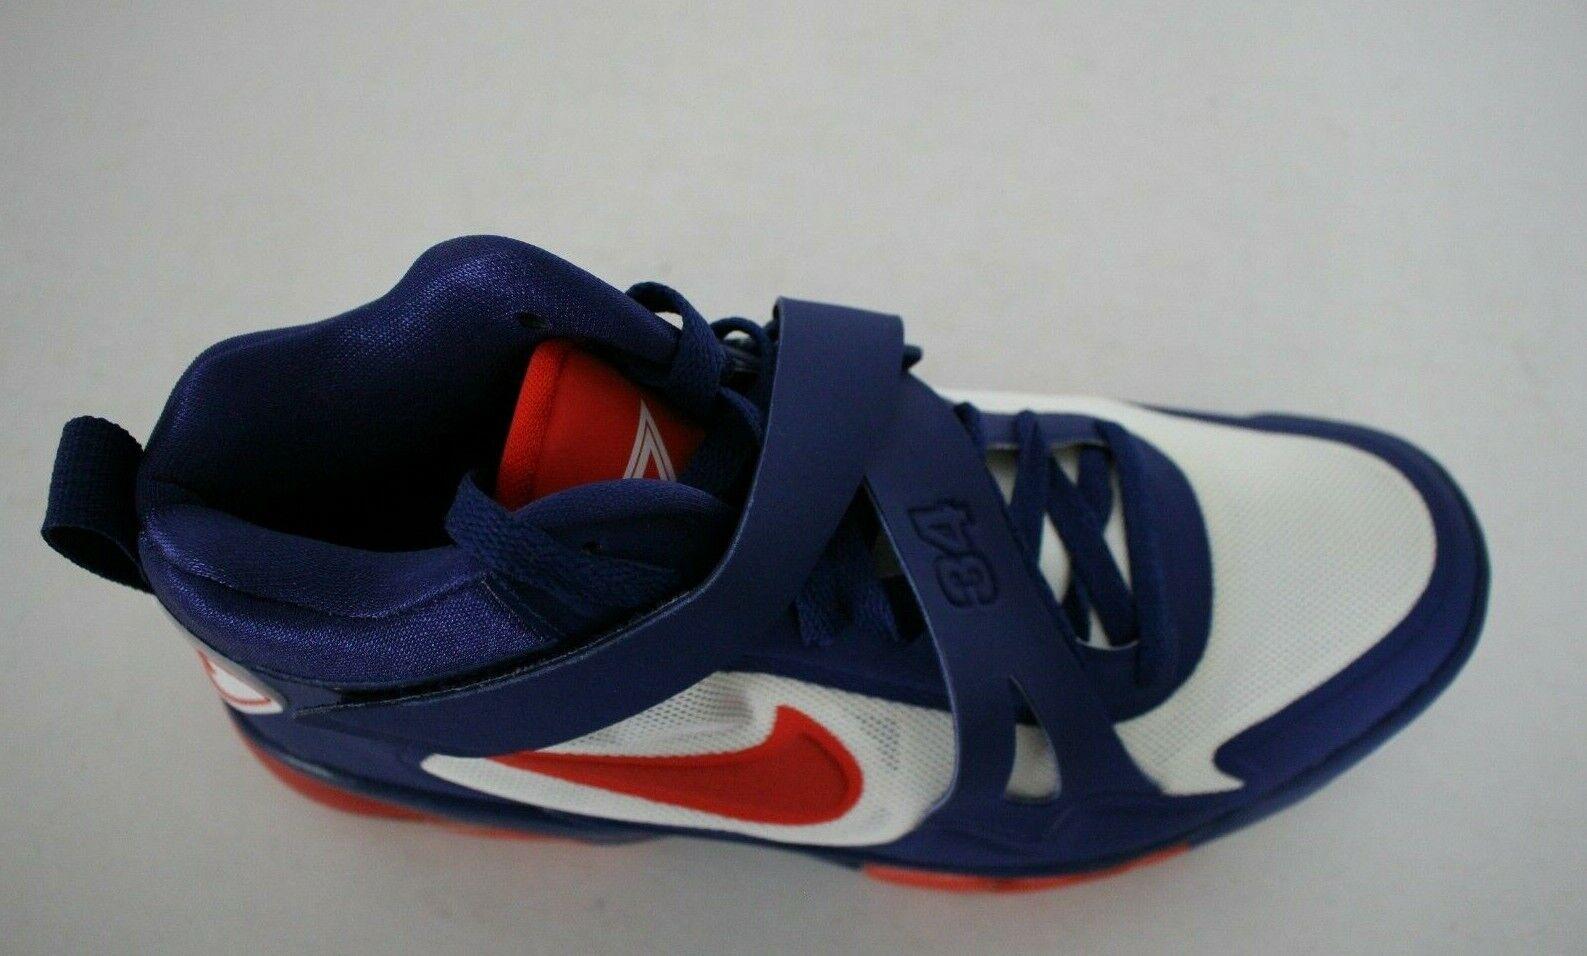 Nike Air Force Max CB 2 Hyperfuse Men's 76ers Barkley RedWhtBlu 616761 400